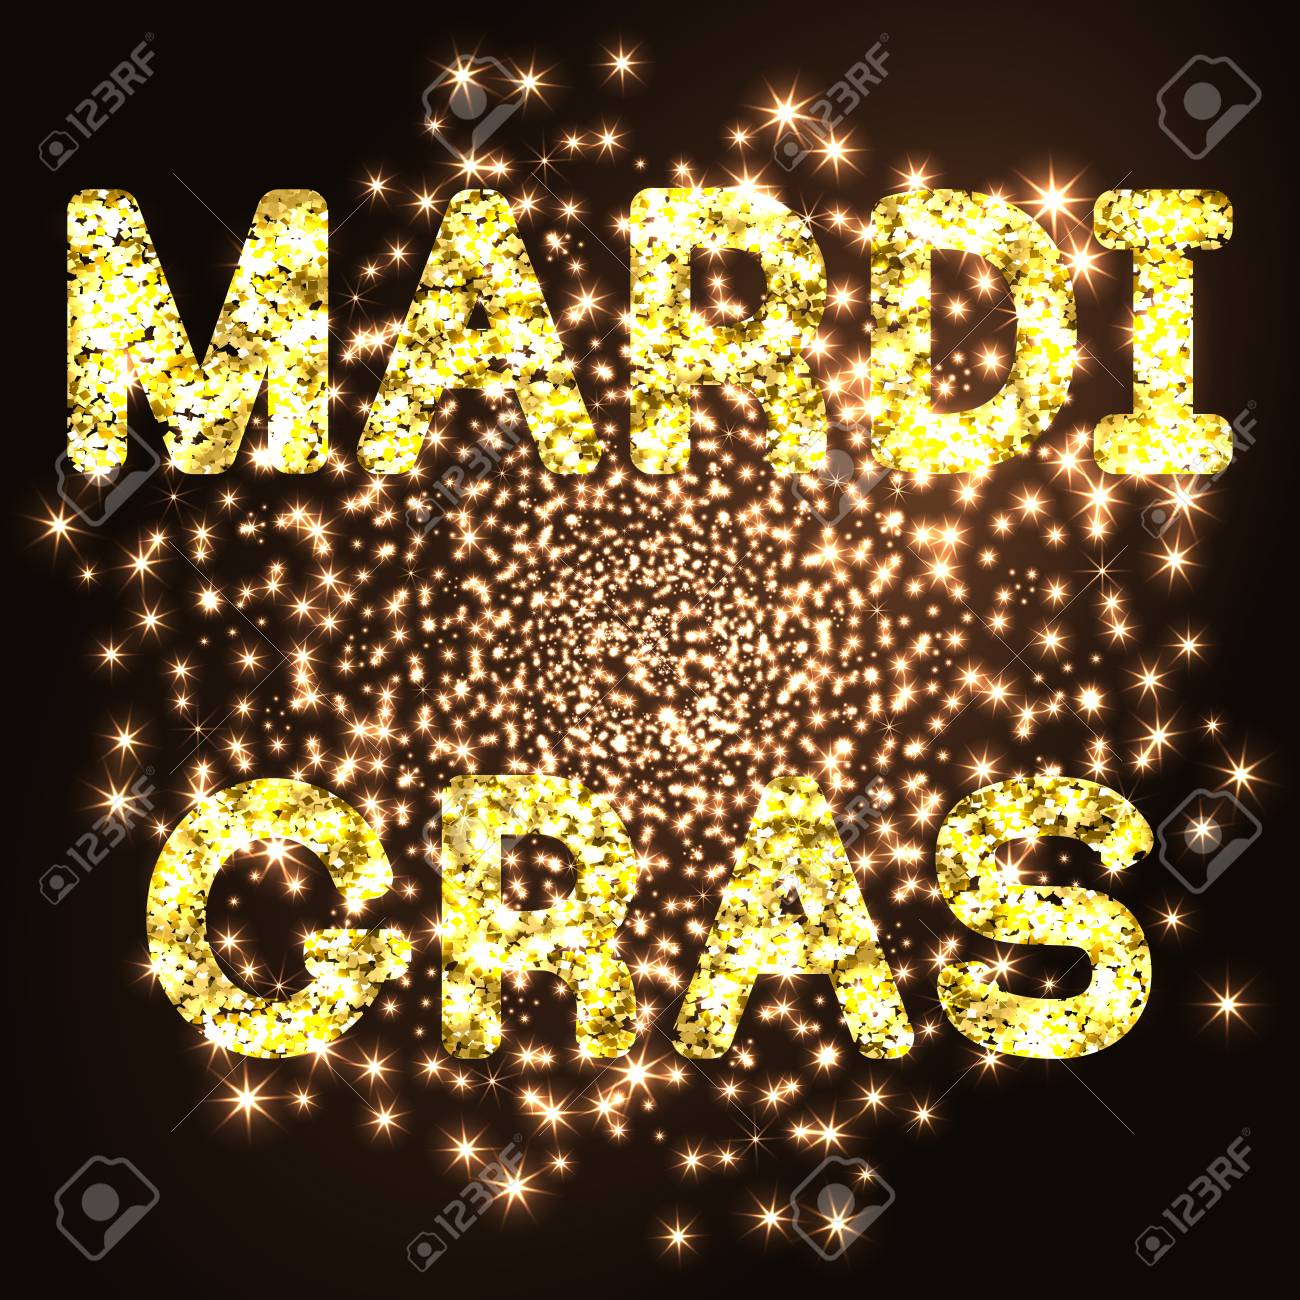 Mardi gras or shrove tuesday golden glitter text on black background mardi gras or shrove tuesday golden glitter text on black background illustration stock vector arubaitofo Choice Image